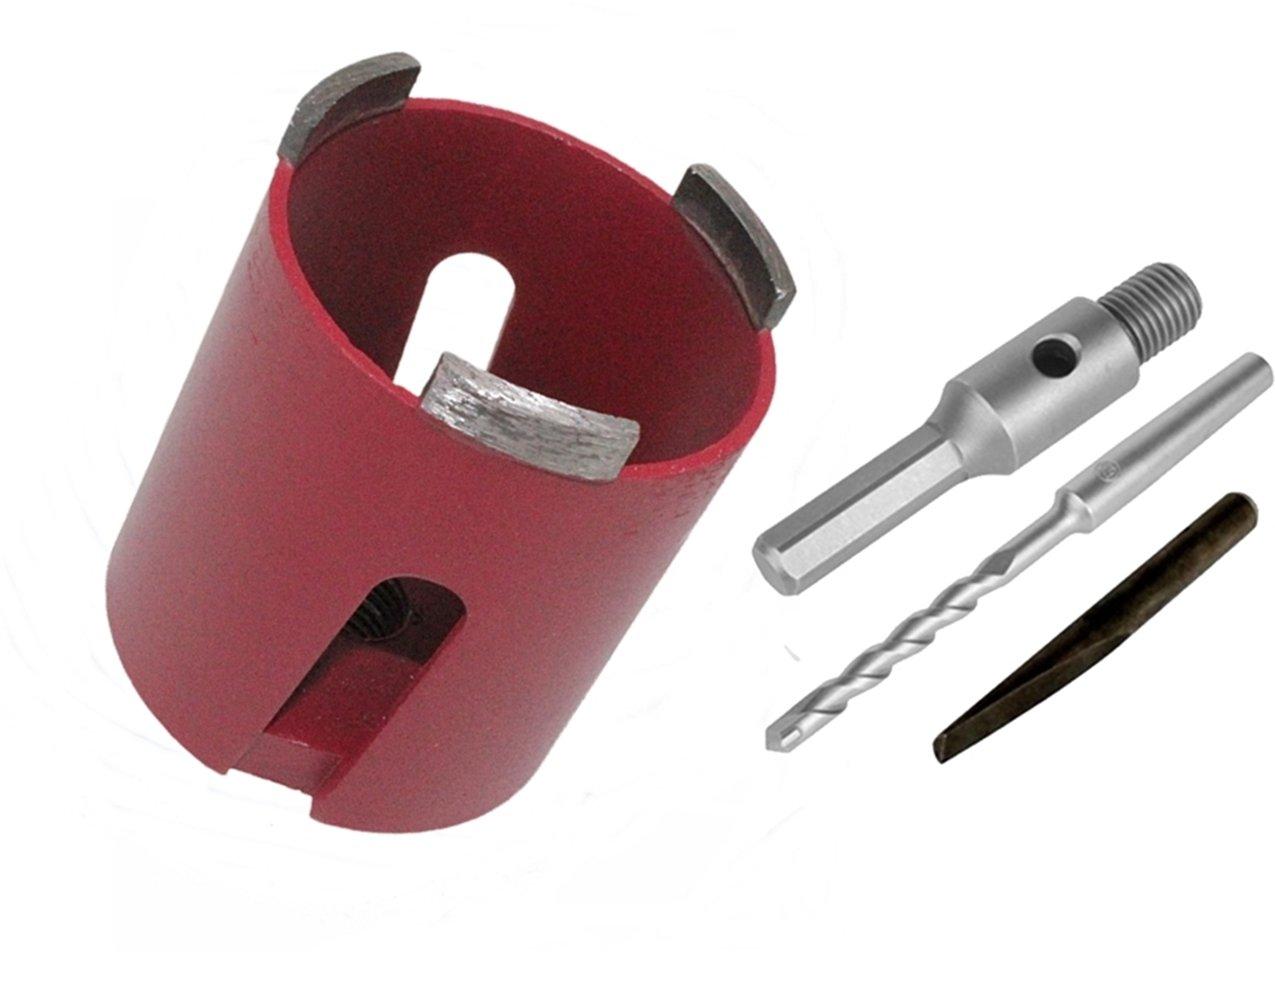 Diamant-Dosensenker-68-82-mm-Bohrkrone-M16-SDS-Aufnahme-Sechskantaufnahme-Dosensenker-68-mm-inkl-Sechskant-Aufnahme